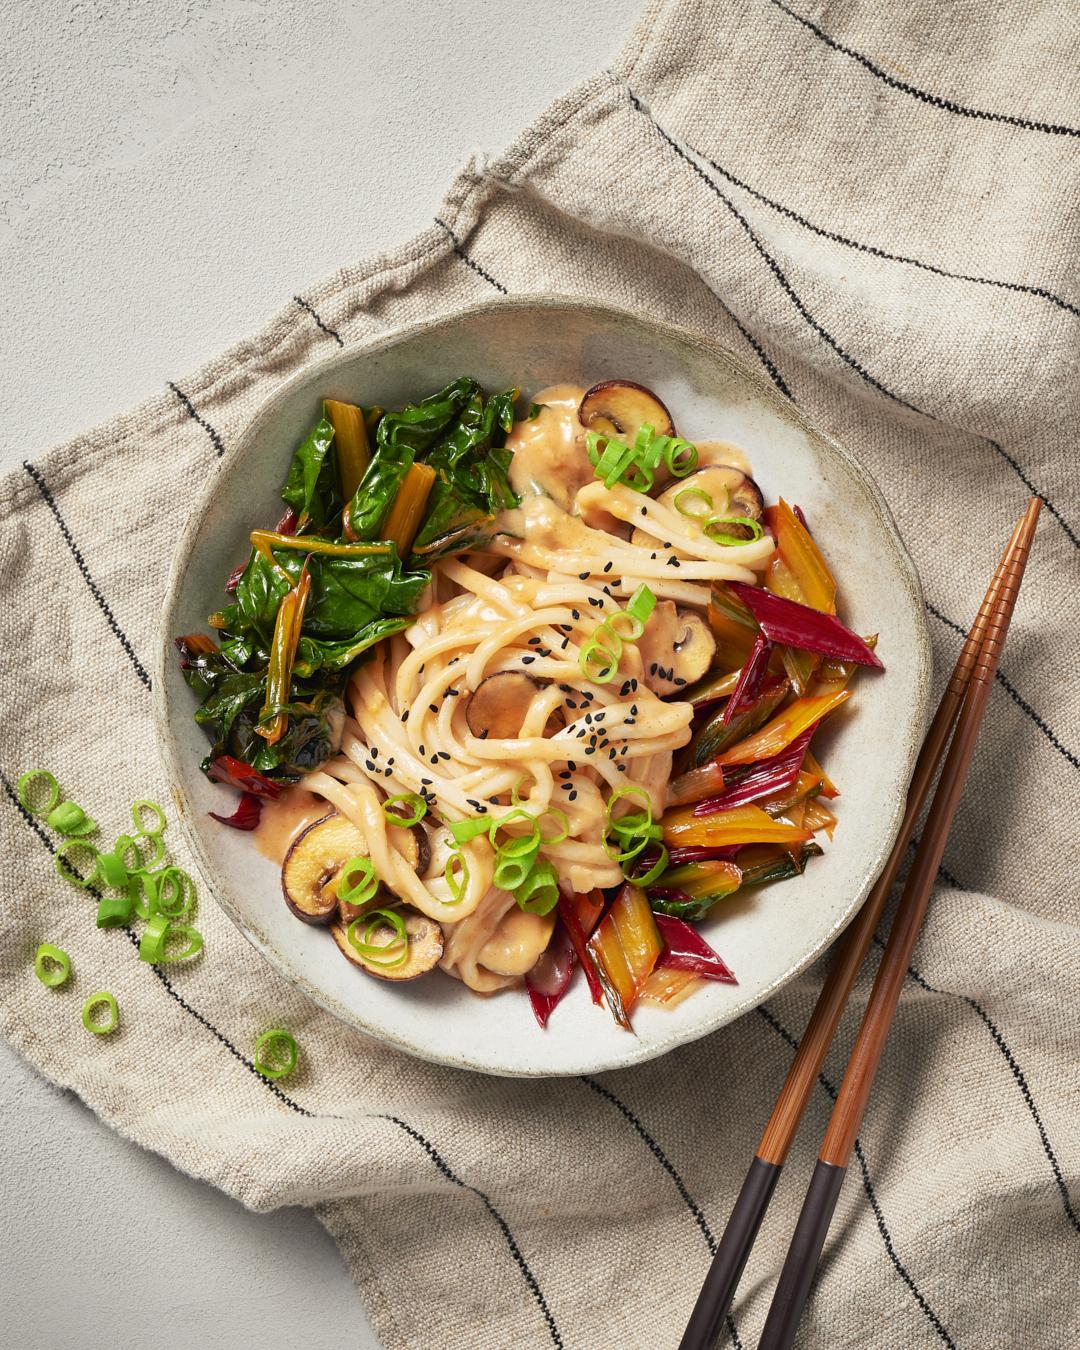 udon-nudel-bowl-mangold-miso-asiatisch-champignons-chopsticks